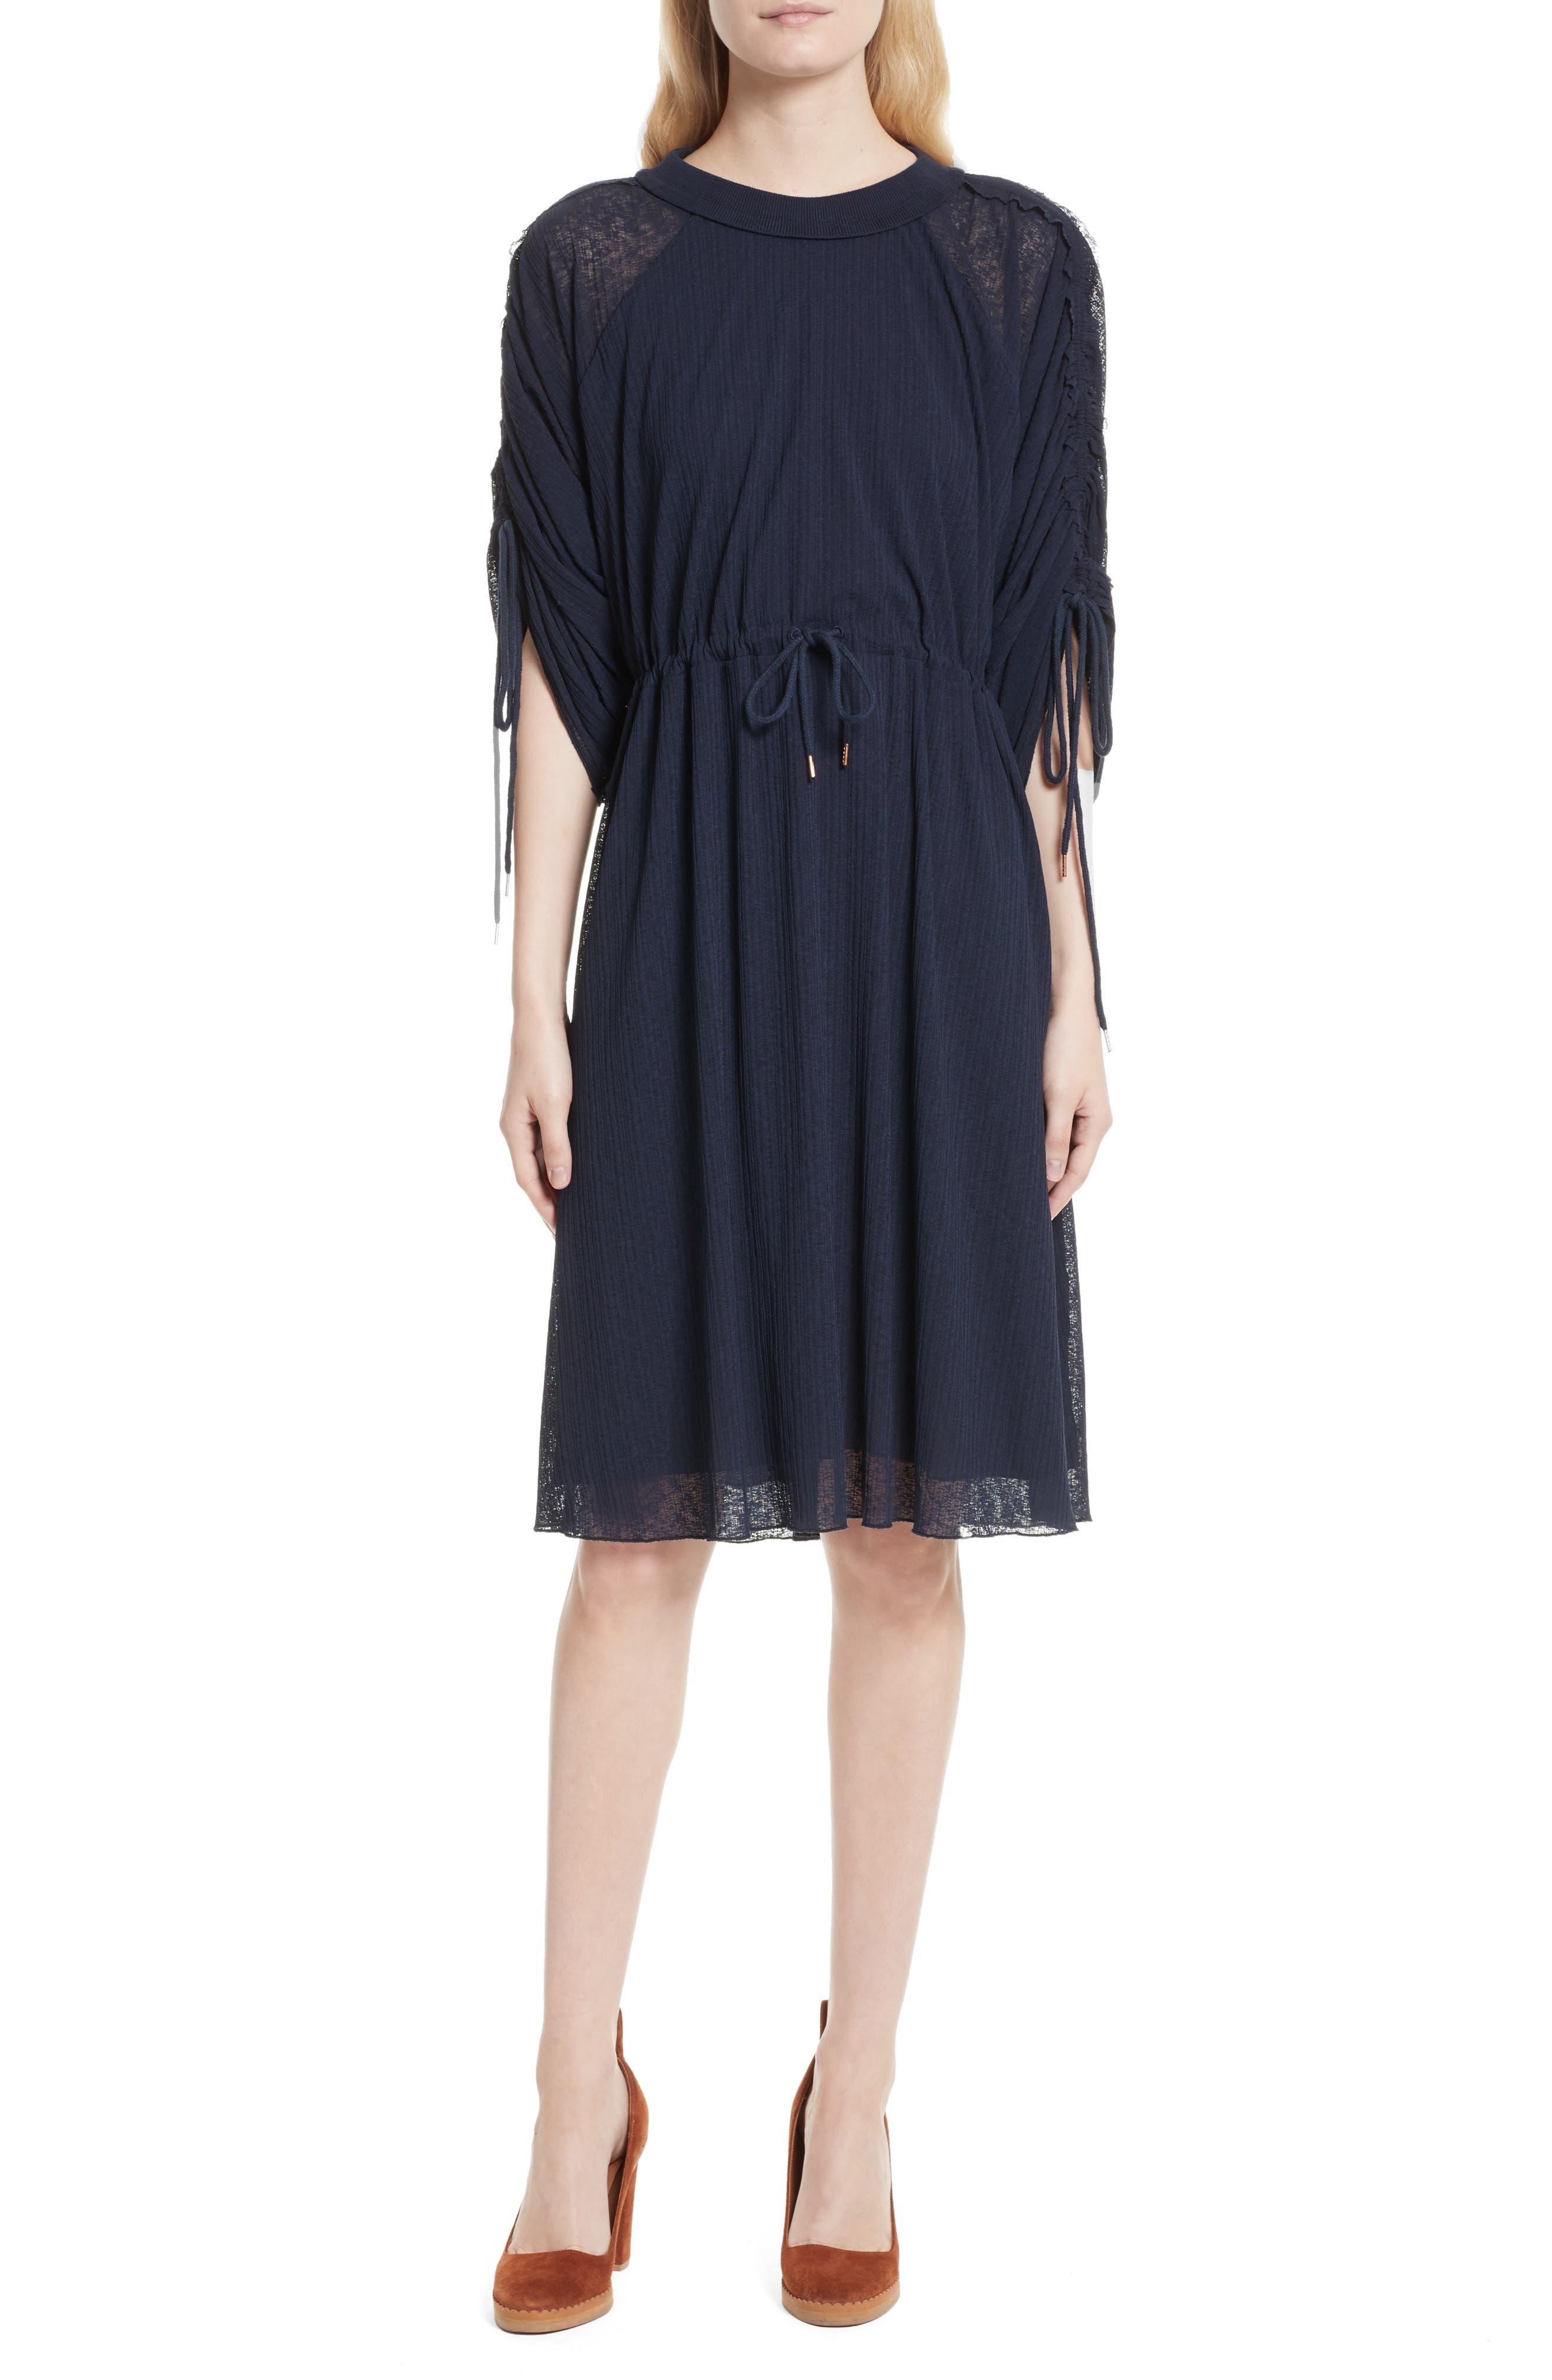 Alternate Image 1 Selected - See by Chloé Knit Raglan Dress